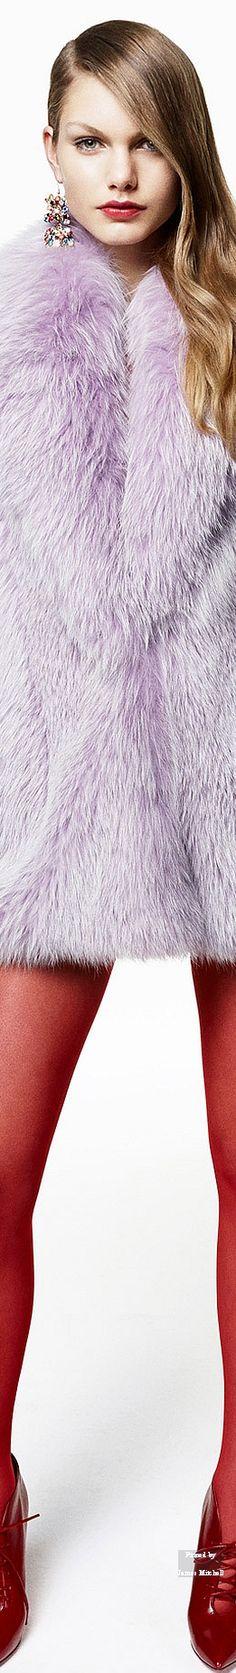 Canada Goose jackets outlet shop - 1000+ images about Fancy Furs on Pinterest | Fur Coats, Fur and ...